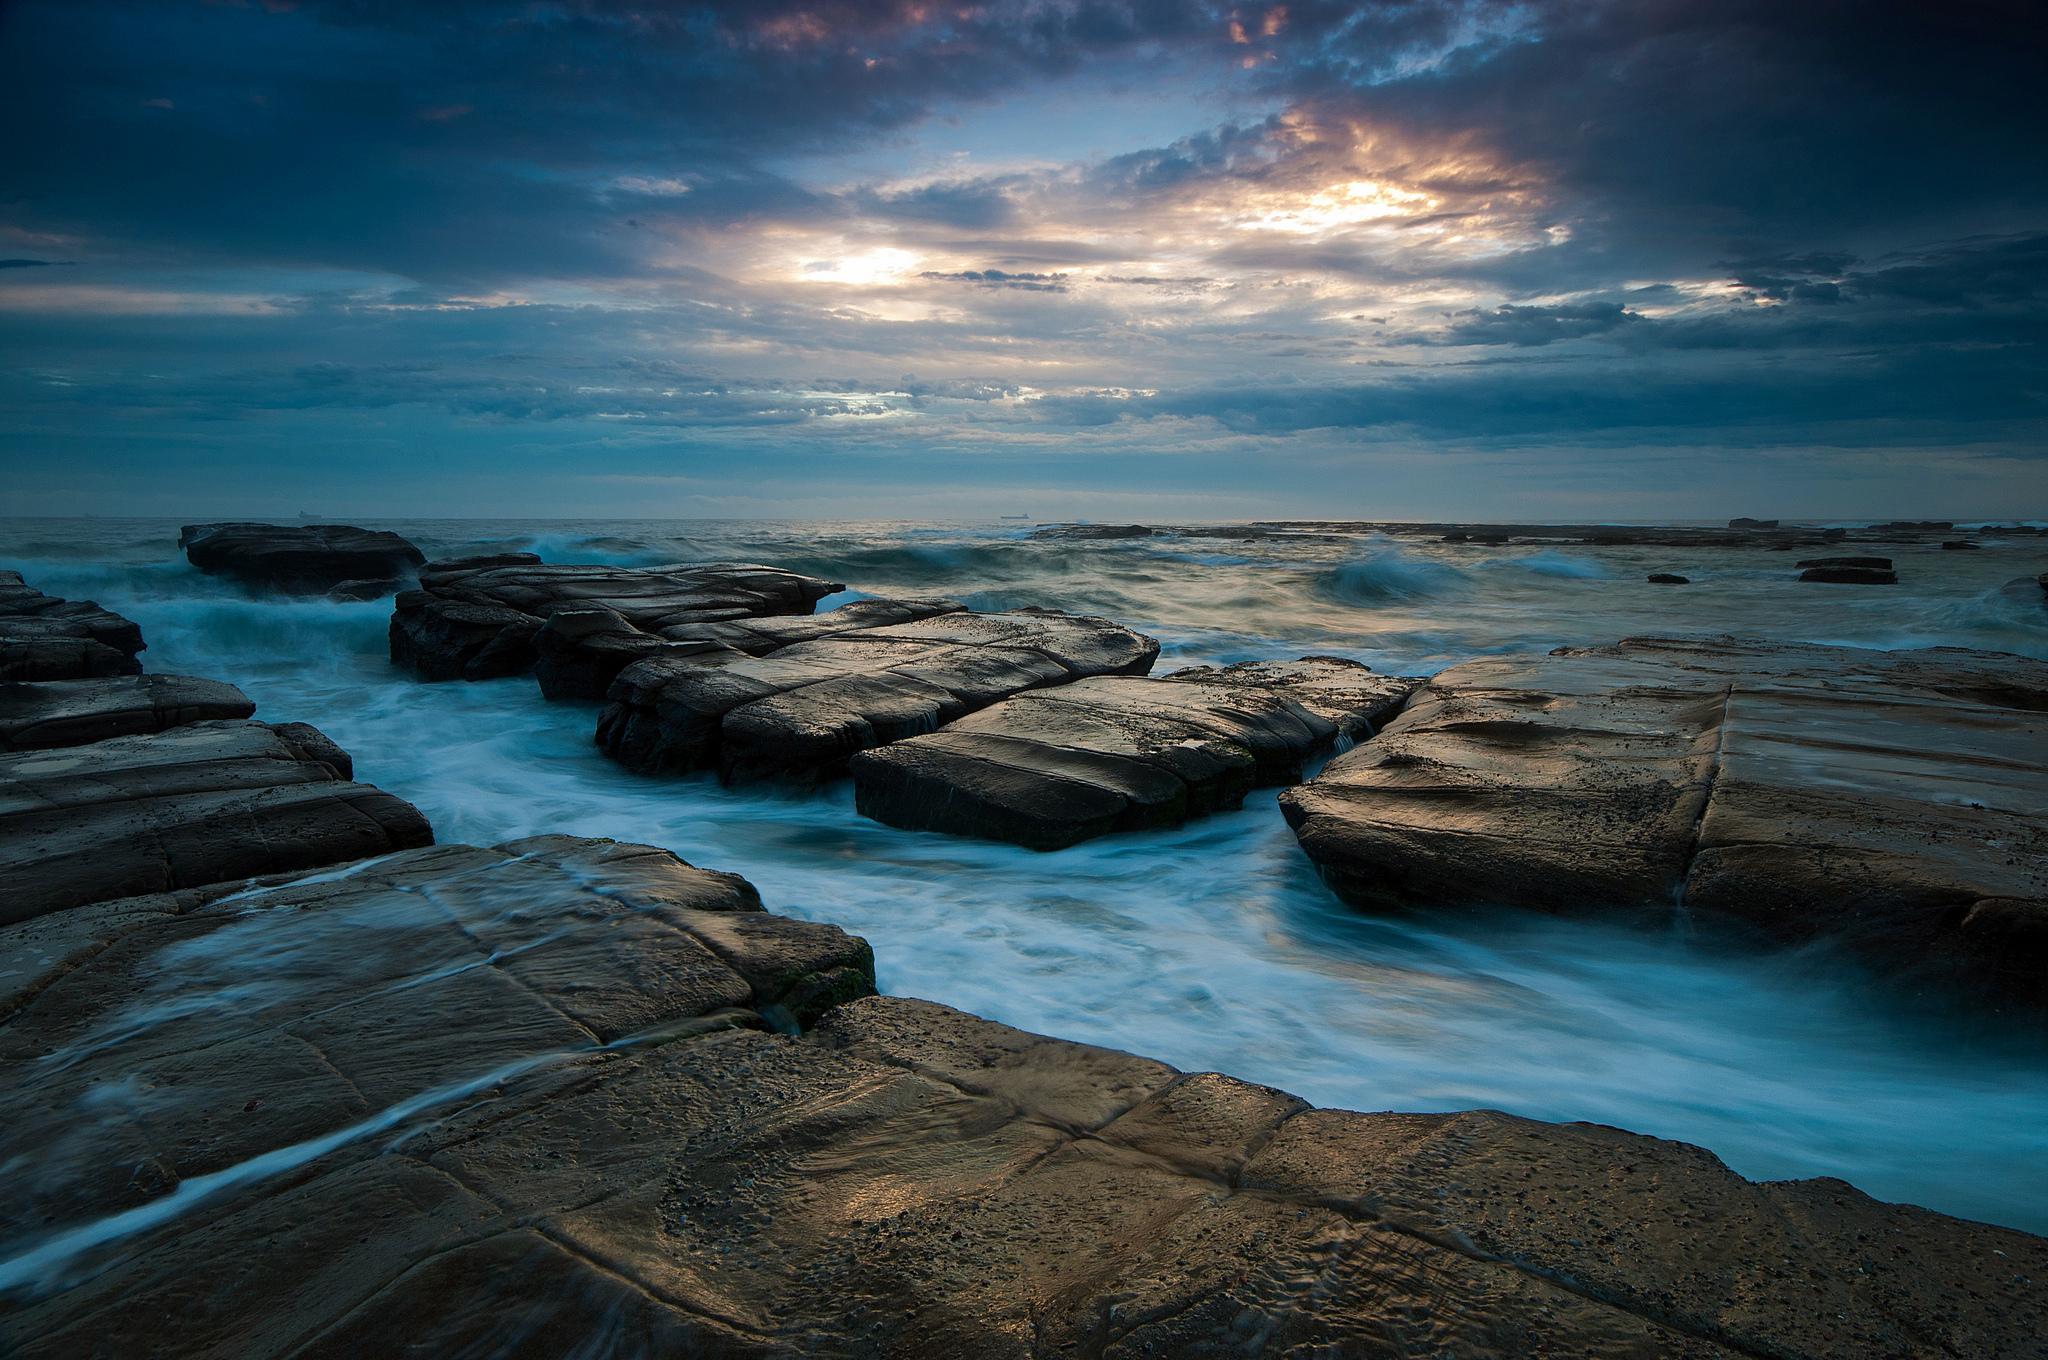 природа море горизонт камни облака небо скалы  № 432333 без смс